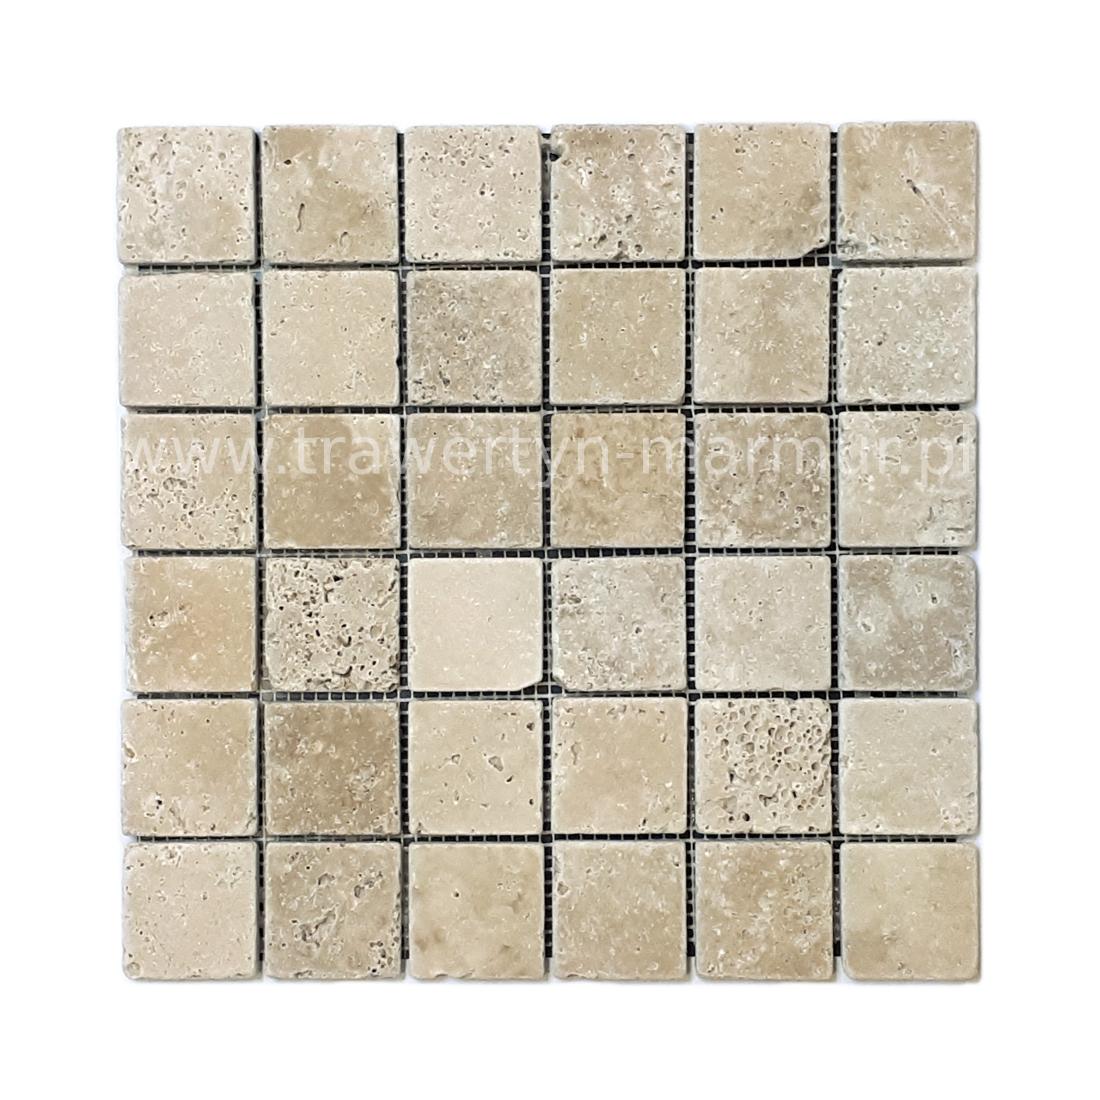 Mozaika kamienna trawertyn Walnut Tumbled 5cm x 5cm